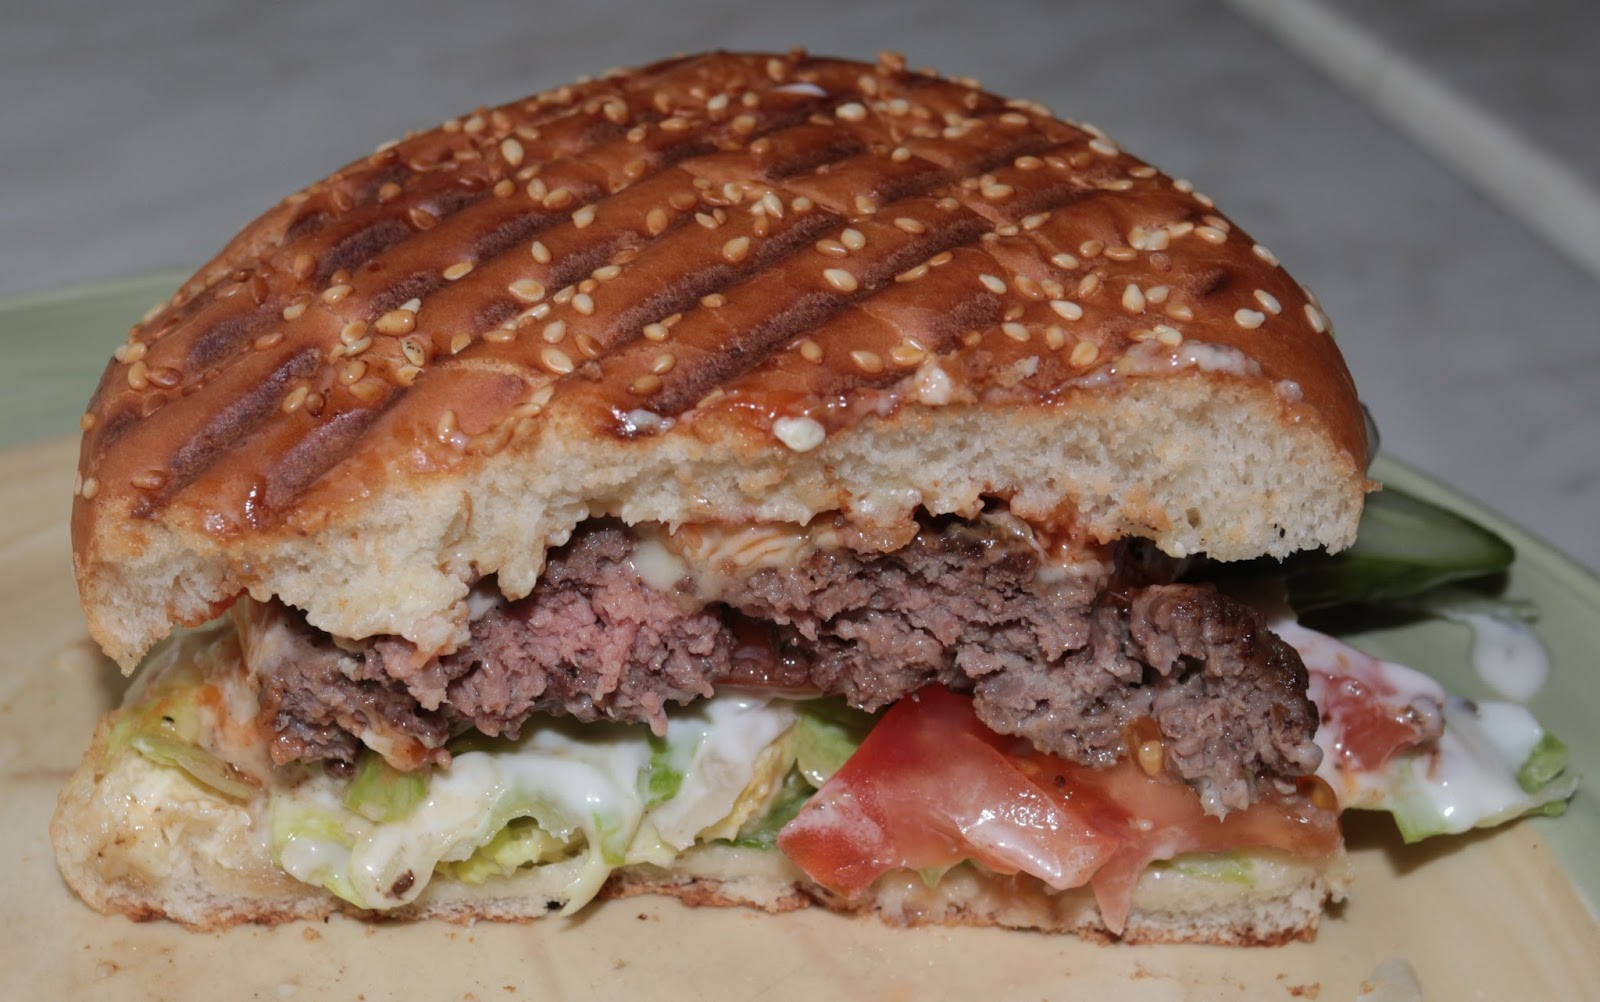 Black Bens Burgerguide Terrassens Cheeseburger